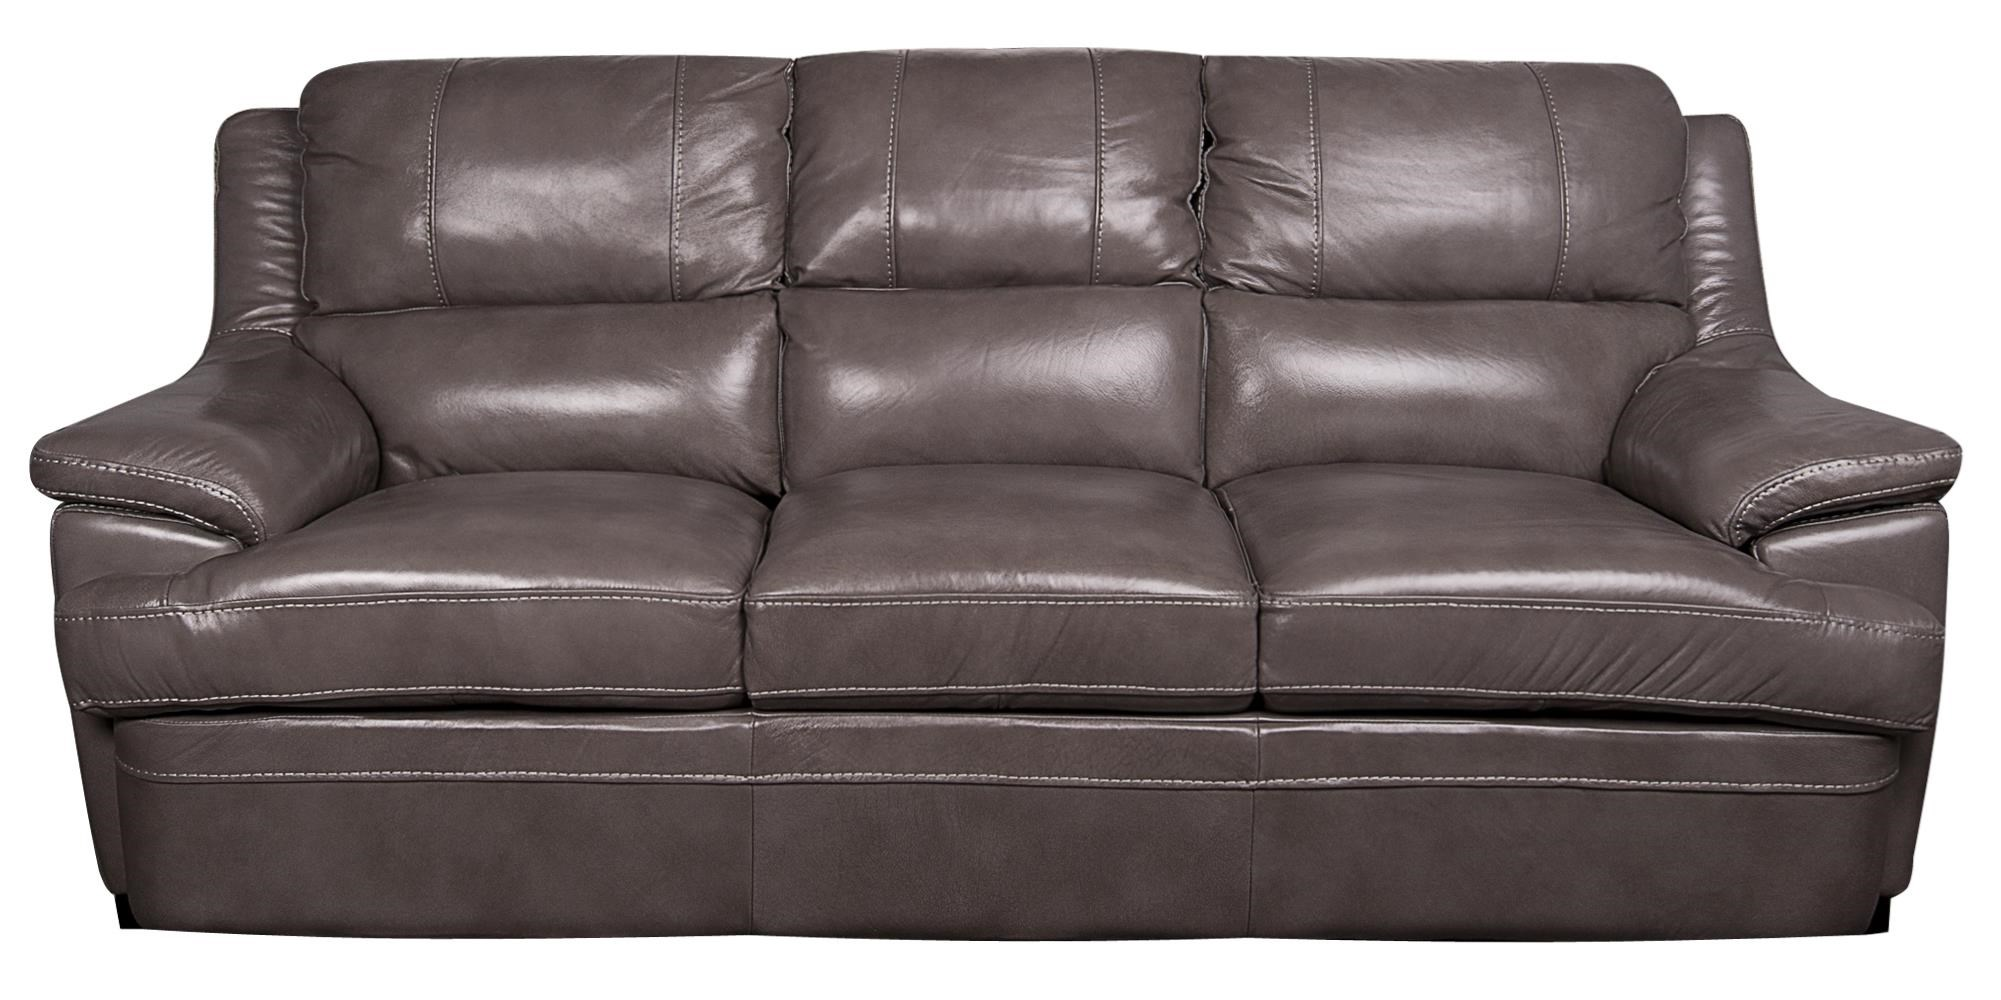 Morris Home Furnishings Zane Zane Leather-Match* Sofa - Item Number: 293706518